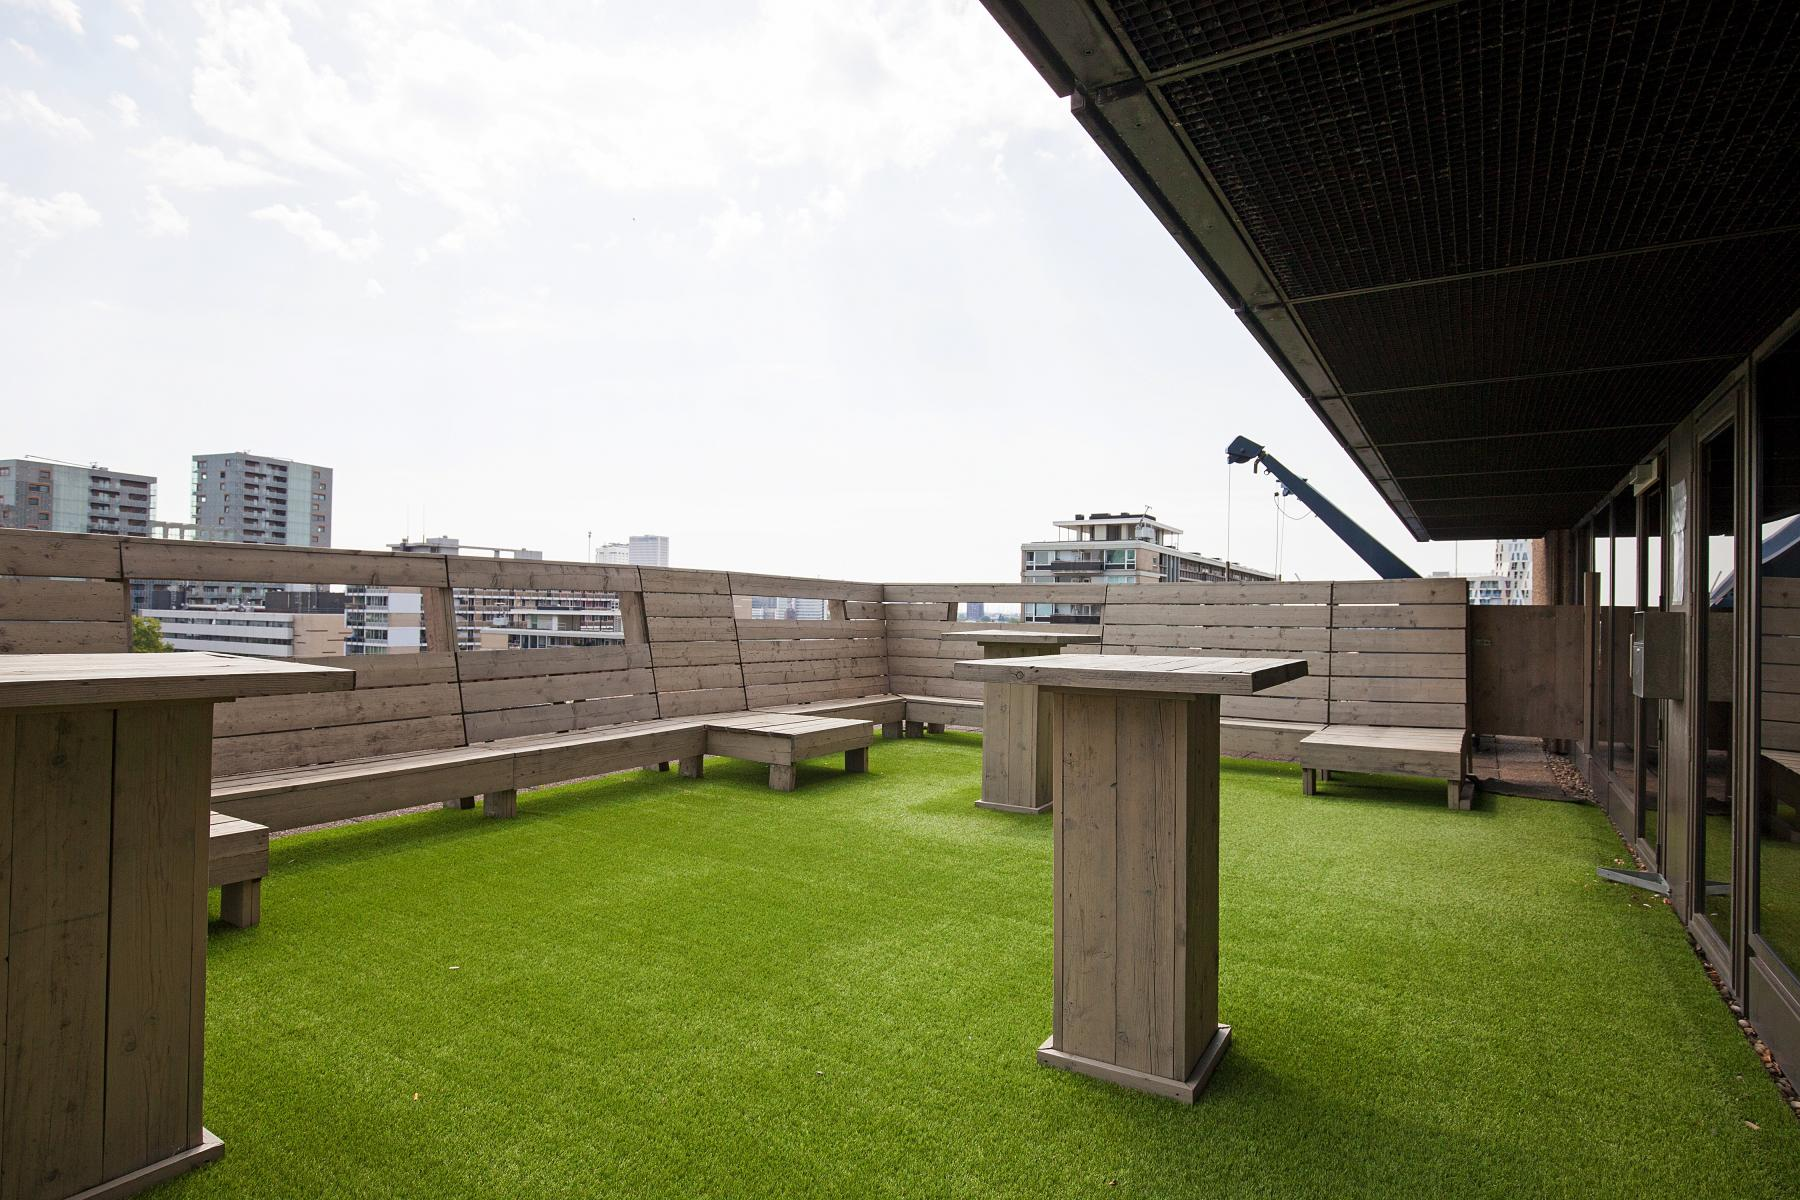 werkplek huren in centrum rotterdam met dakterras